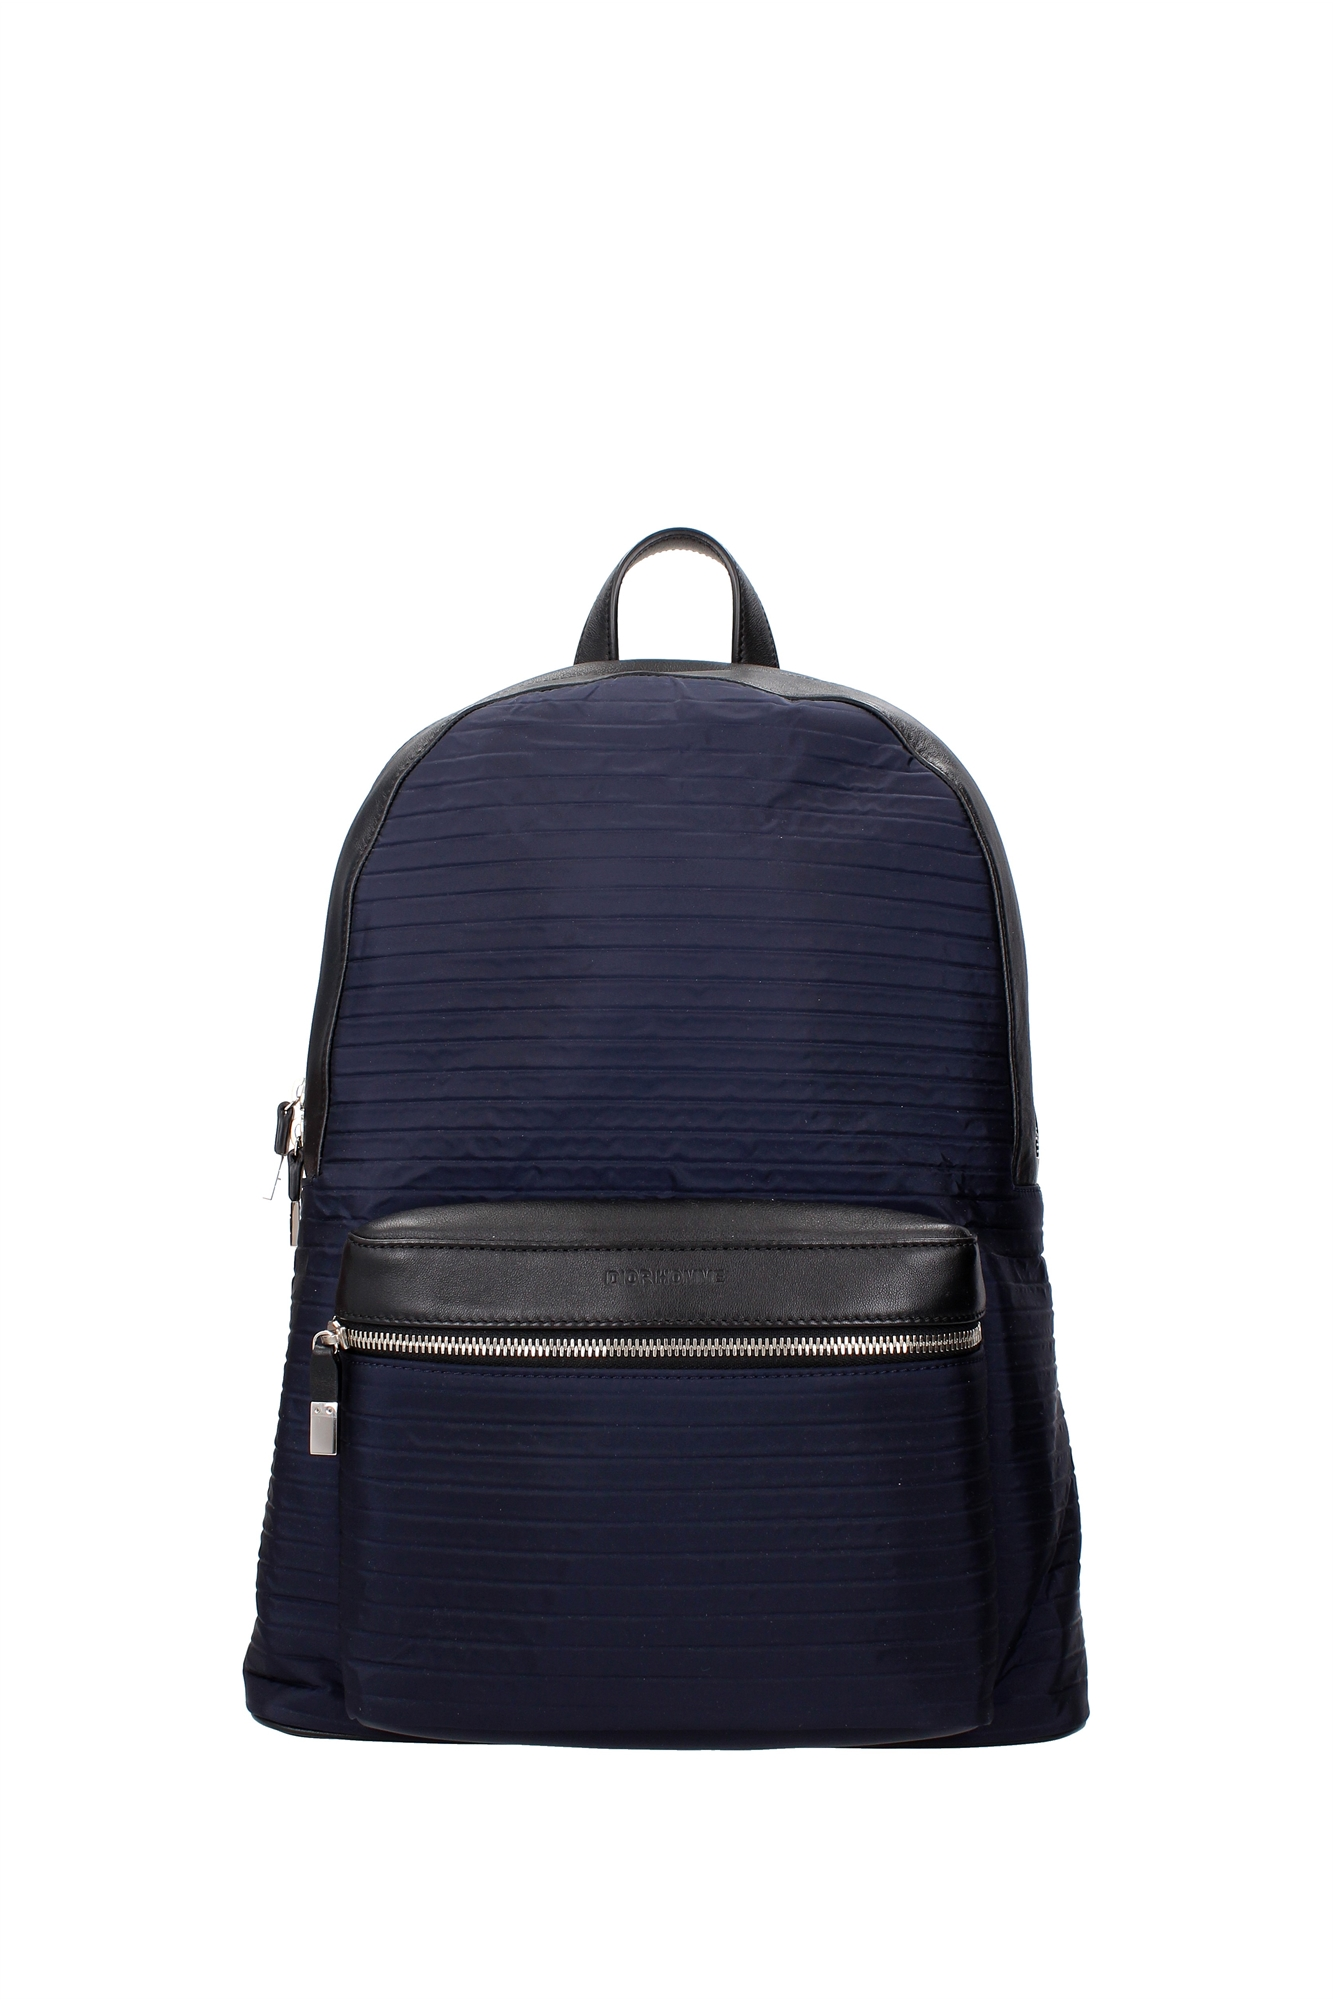 tasche rucksack christian dior herren stoff blau. Black Bedroom Furniture Sets. Home Design Ideas